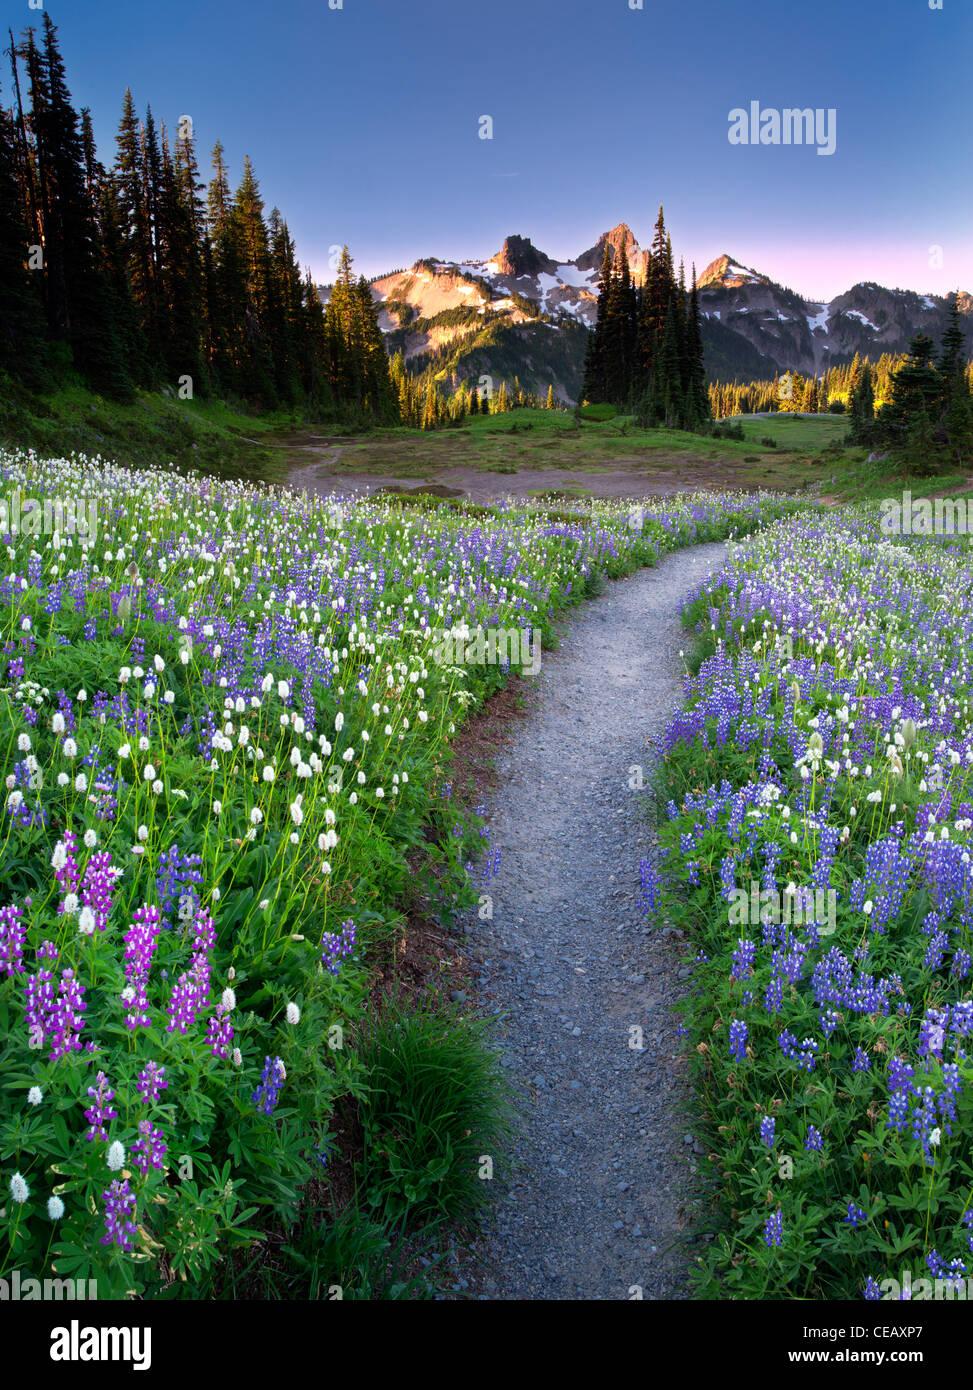 Flores silvestres, ruta y montaña Tatoosh. Mt Rainier National Park, Washington Imagen De Stock